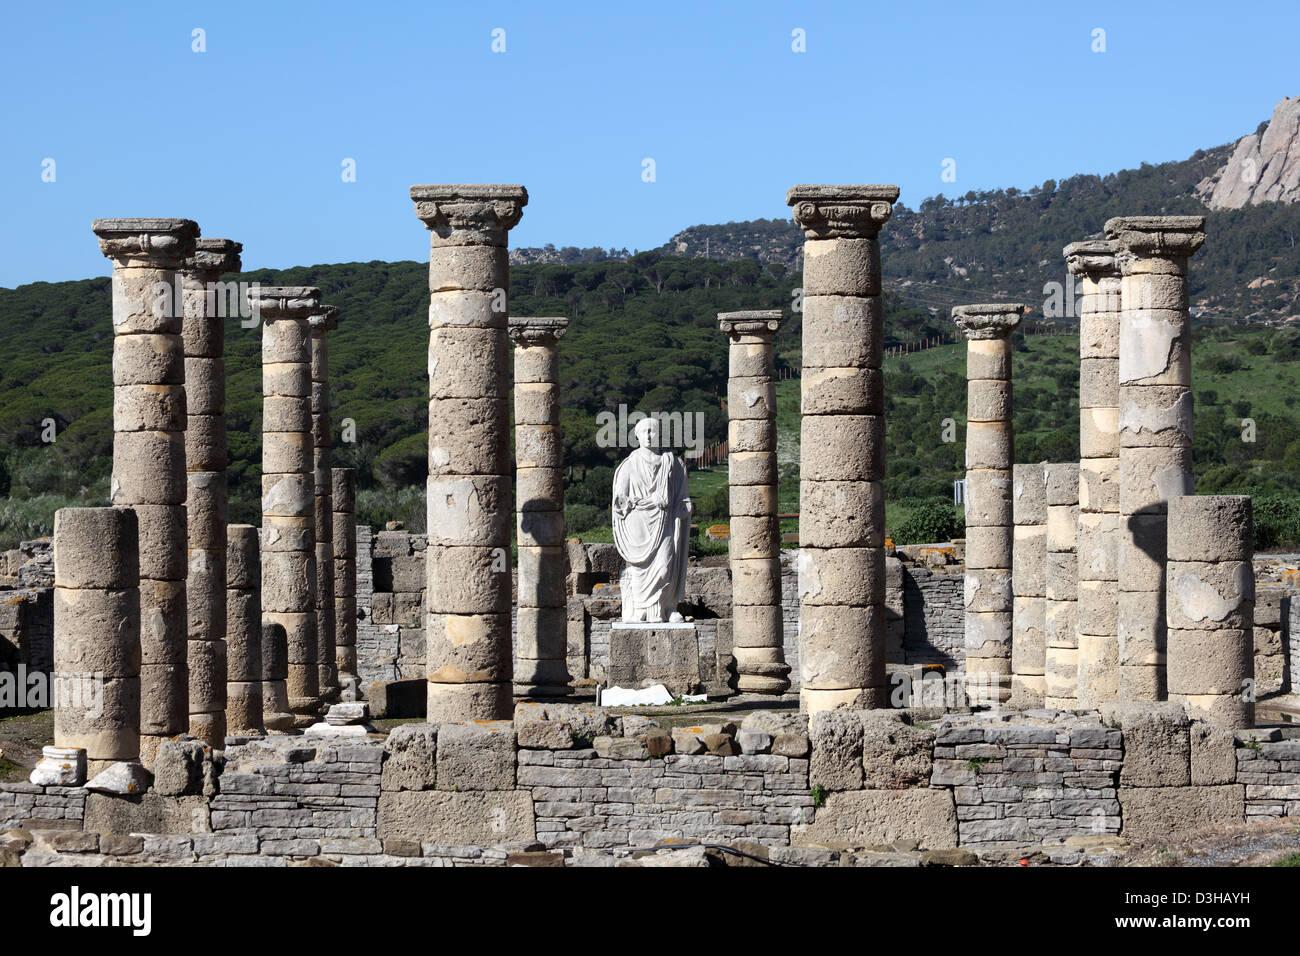 Roman temple ruin in Bolonia, Andalusia, southern Spain Stock Photo